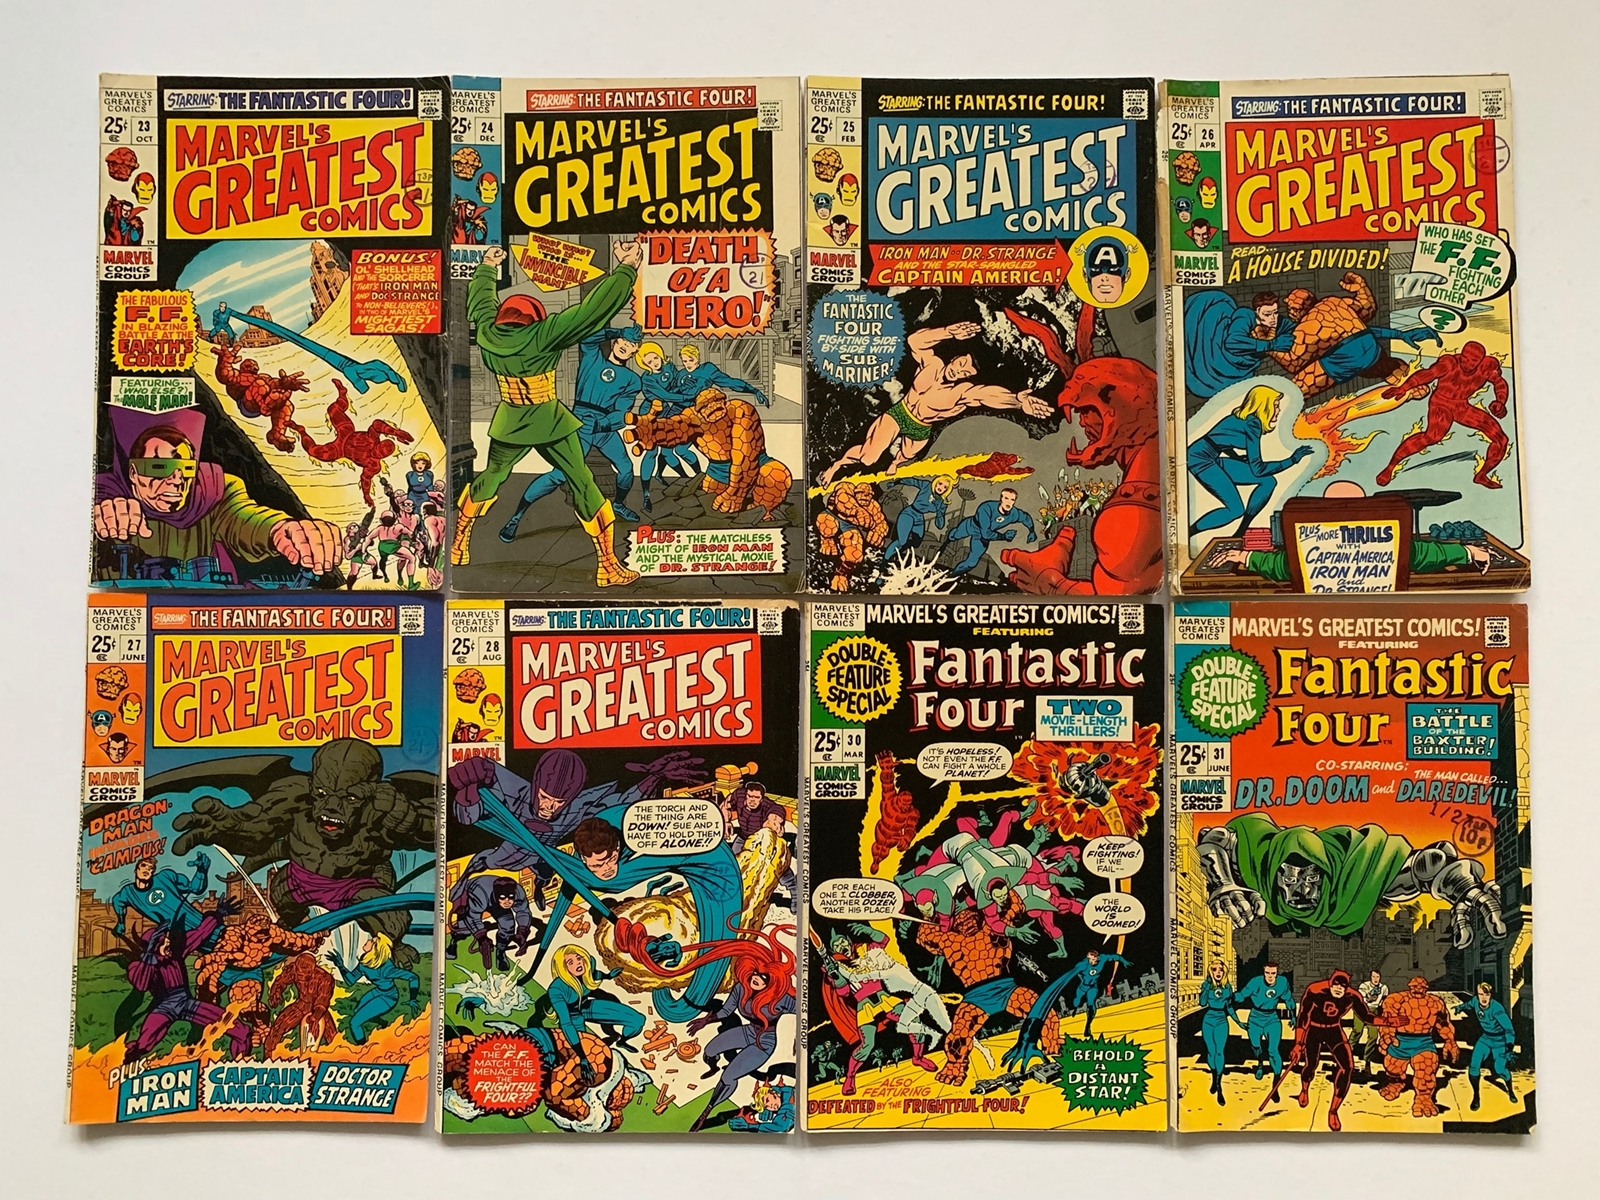 Lot 2067 - MARVEL'S GREATEST COMICS LOT #23, 24, 25, 26, 27, 28, 30, 31 (8 in Lot) - (1969/71 - MARVEL -